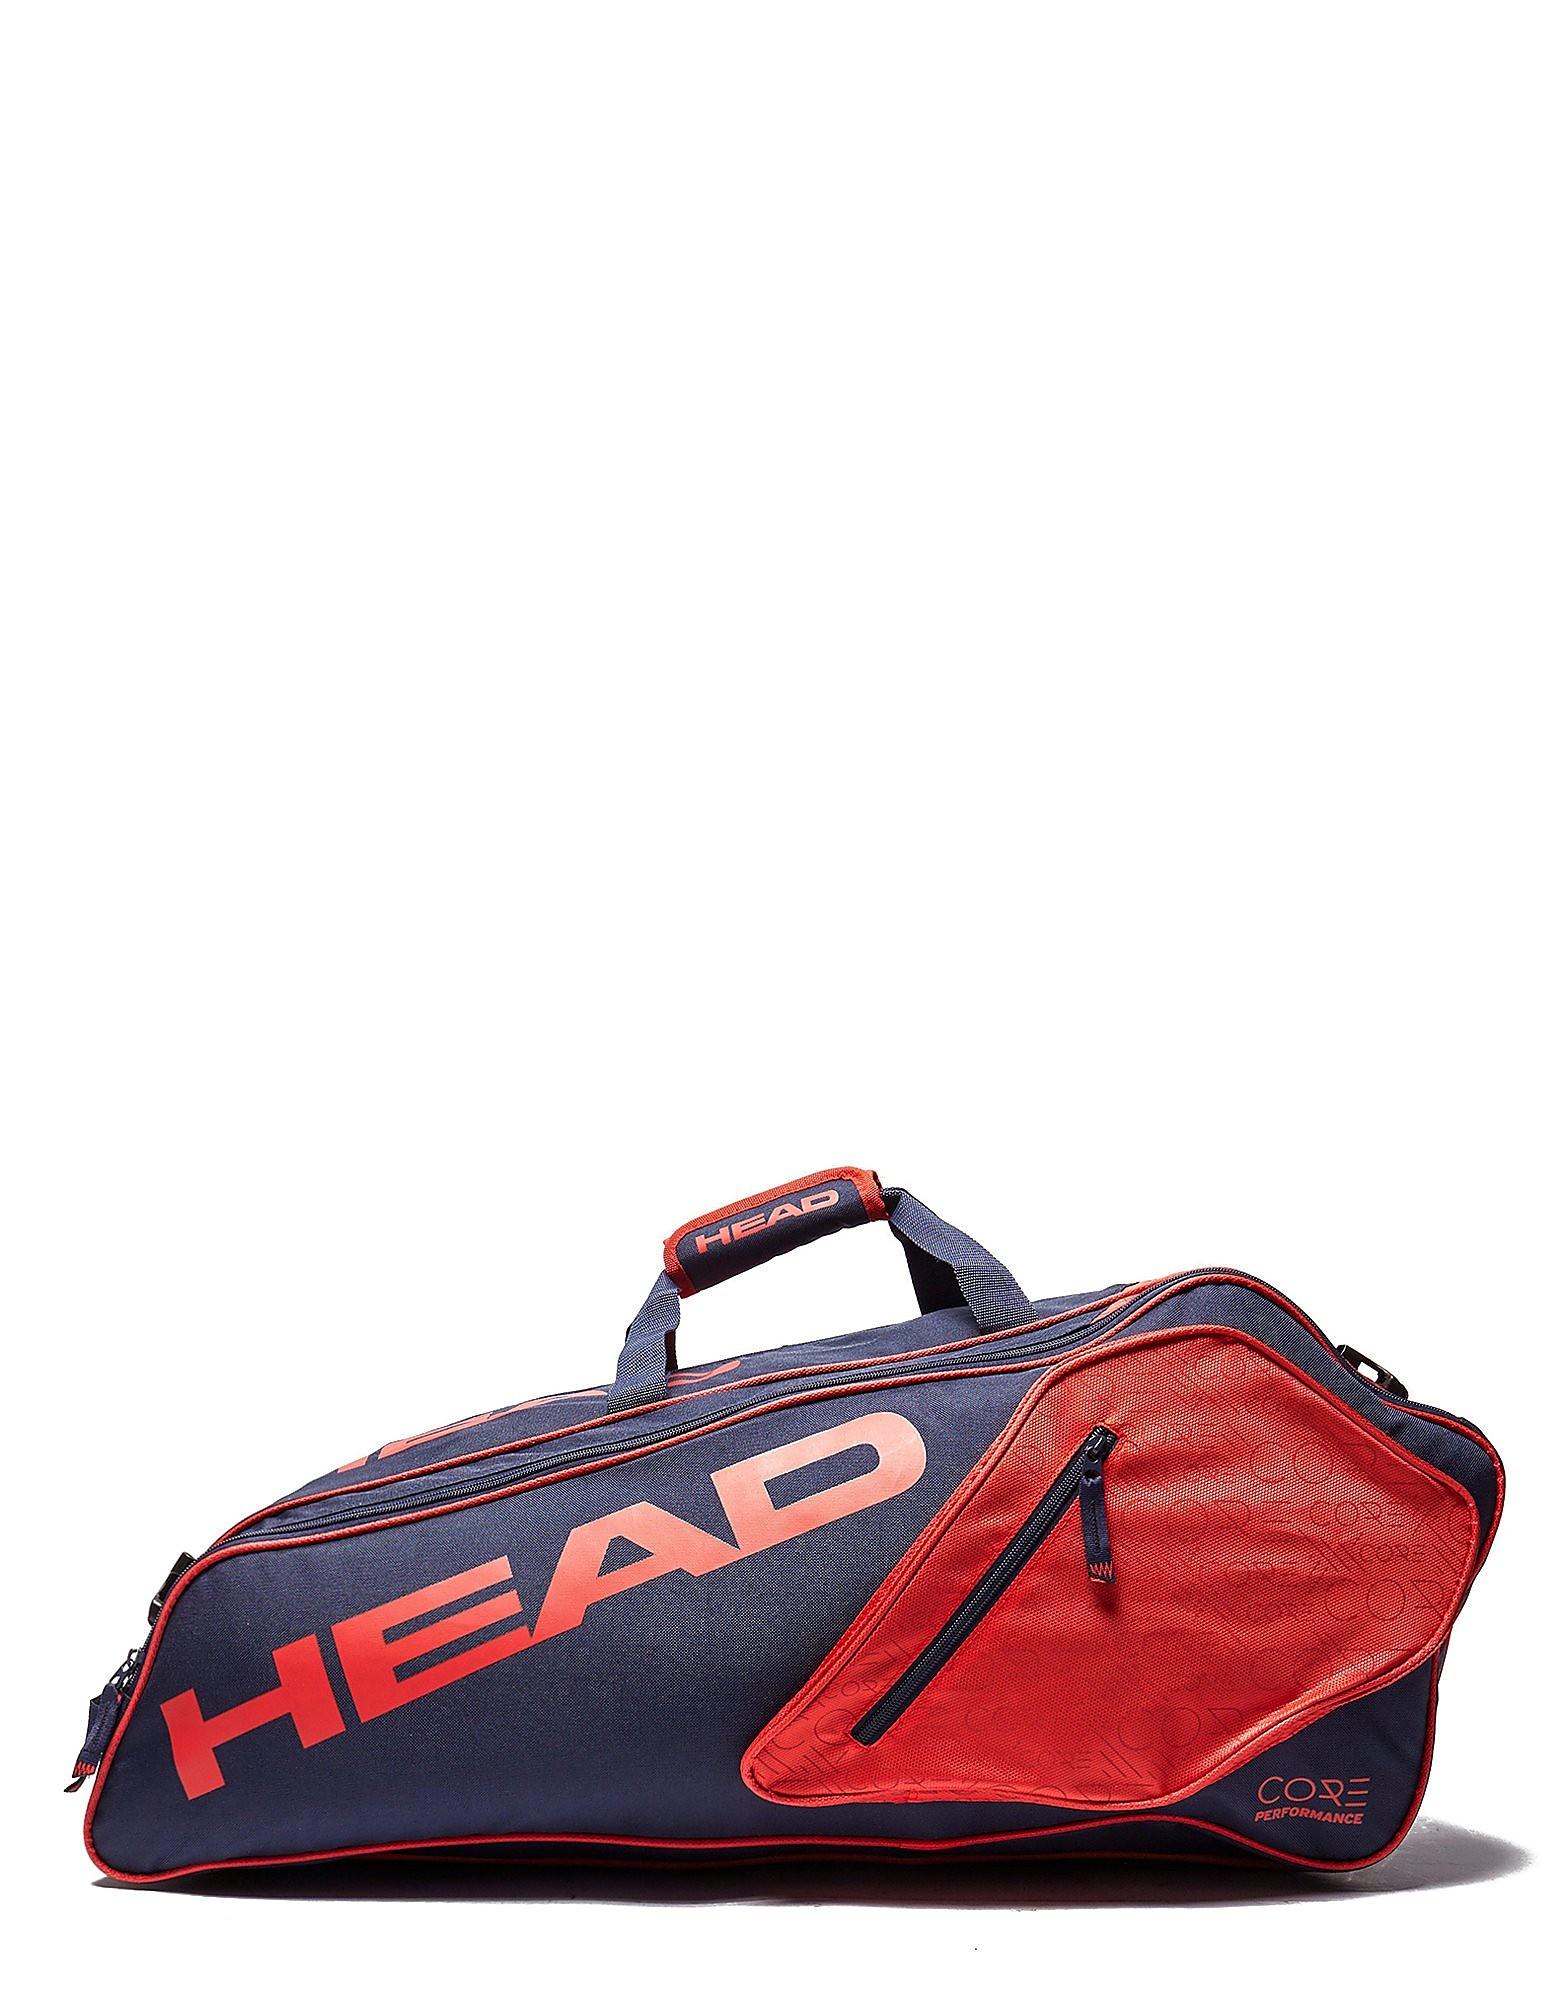 Head Core 9R Supercombi Tennis Racketbag